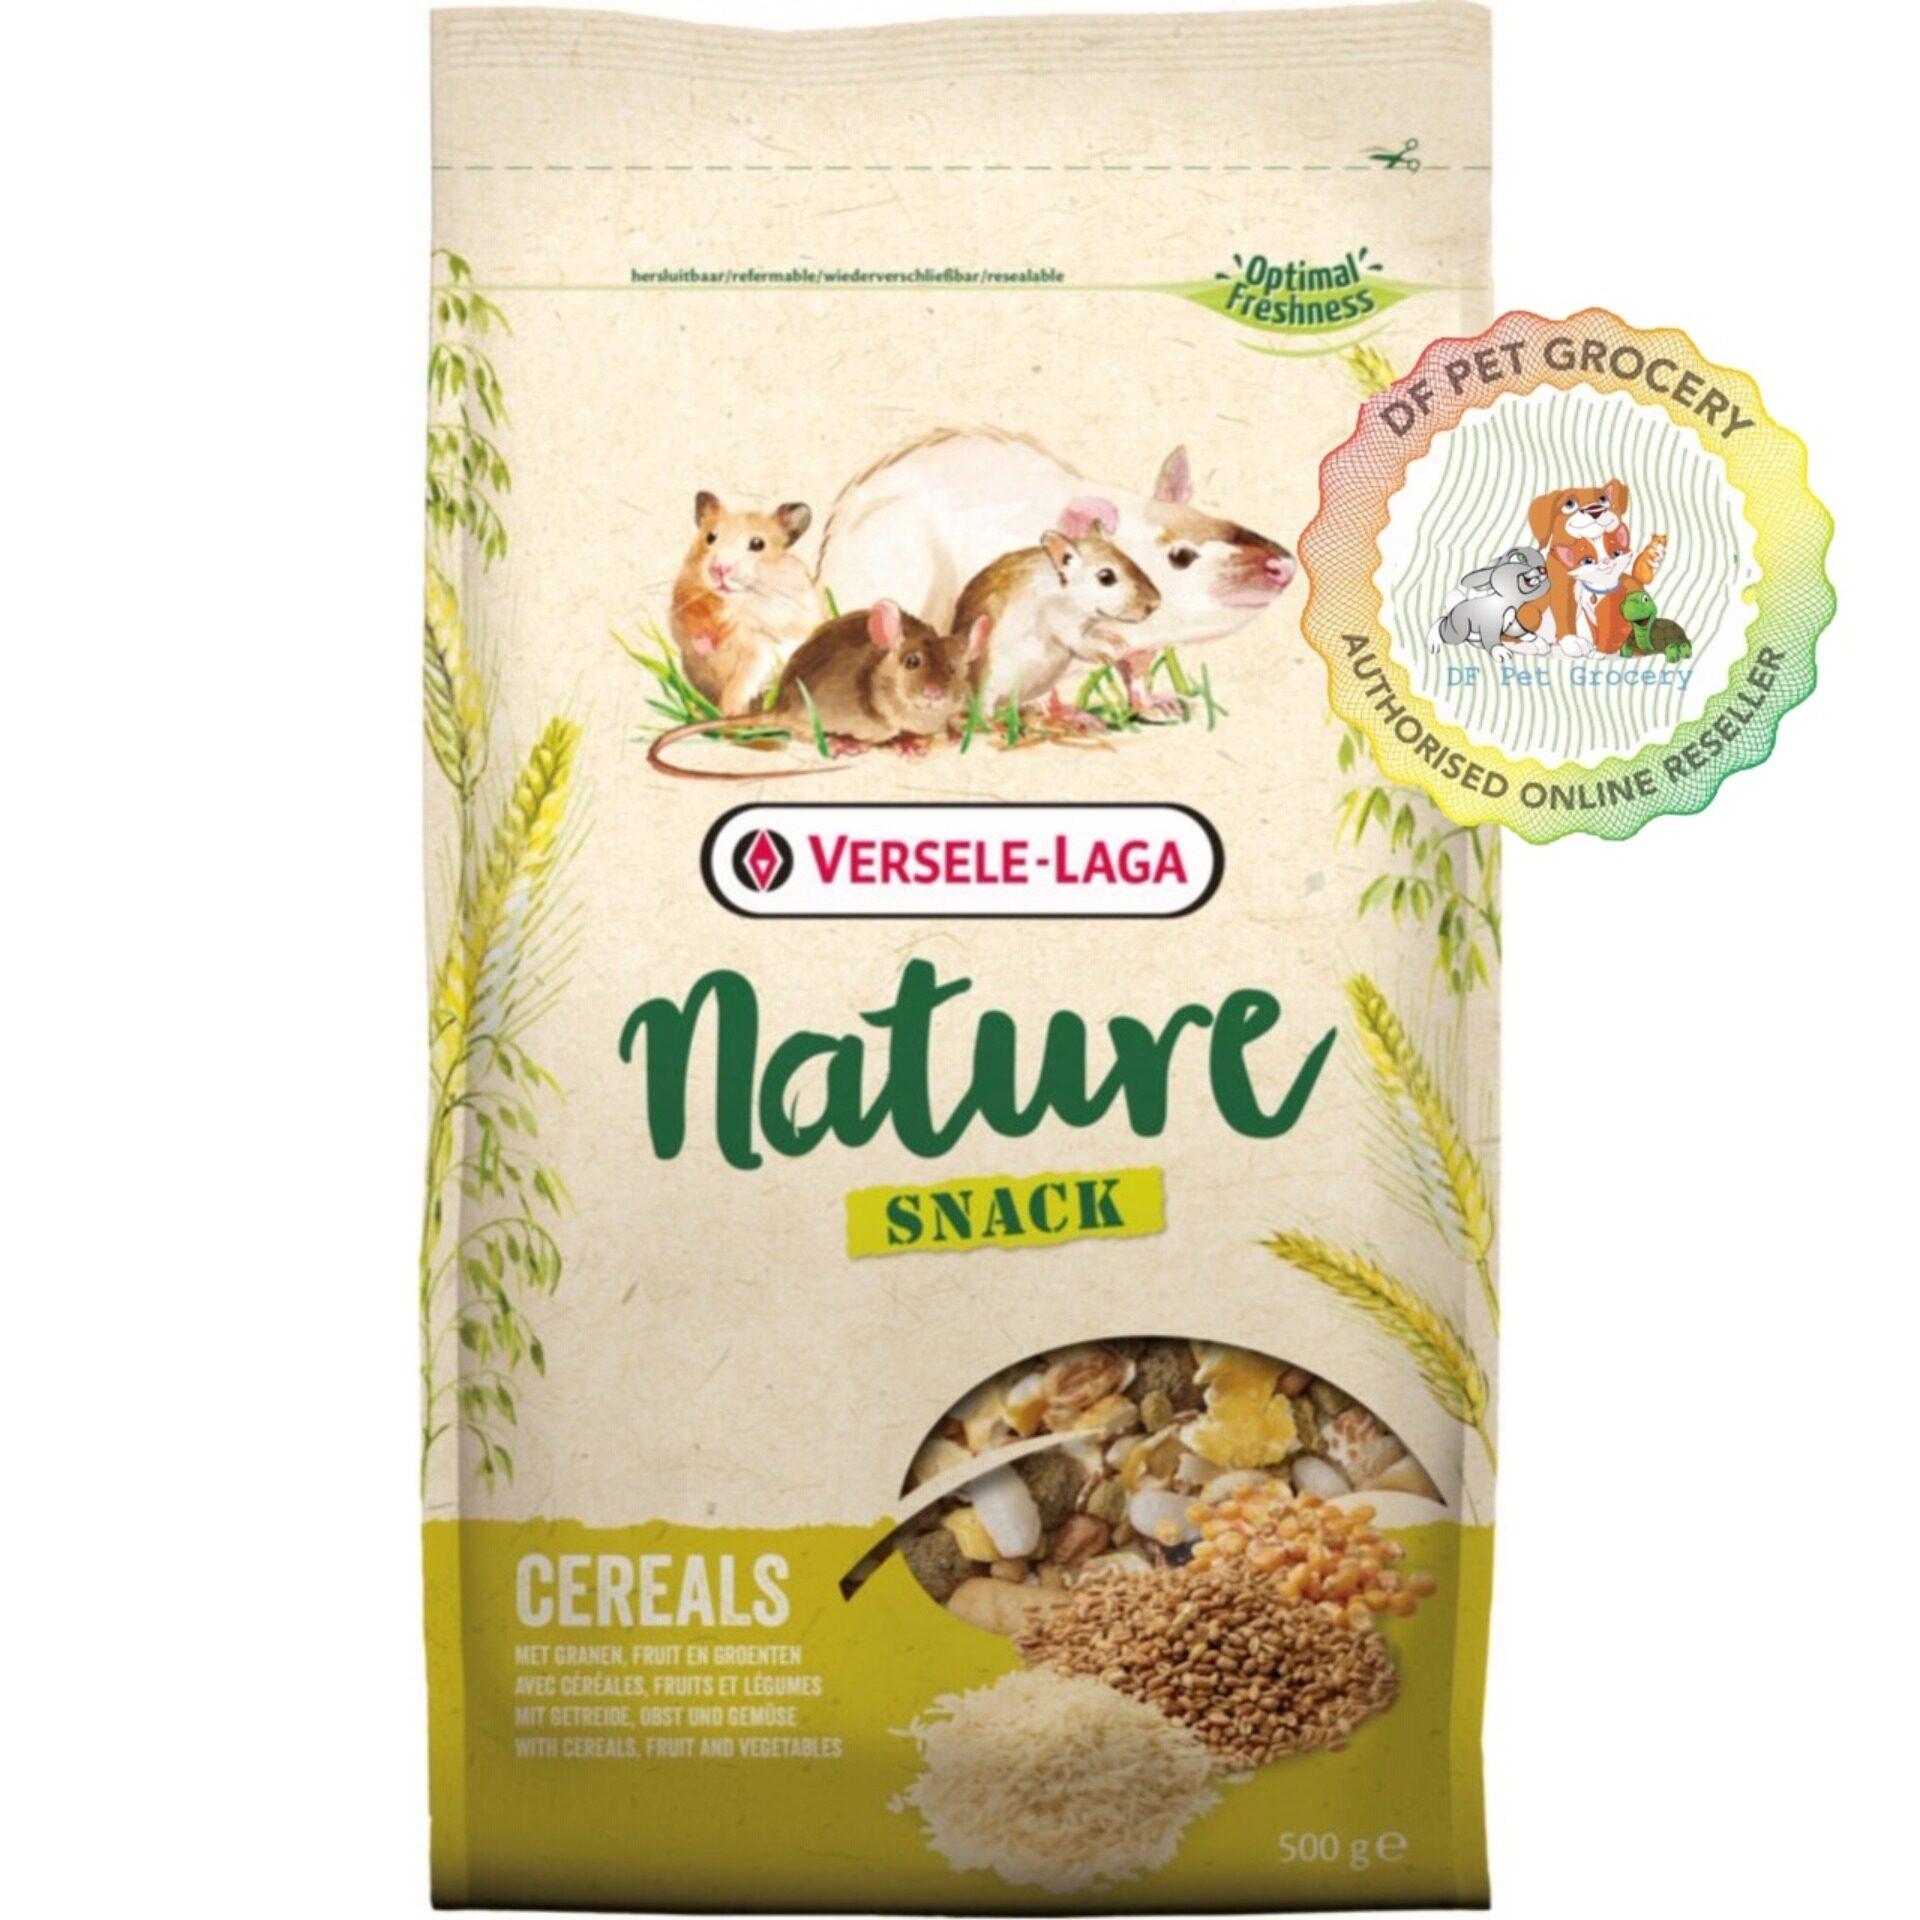 Versele Laga Snack Nature - Cereals 500G(Rabbit,Guinea Pig,Hamster)